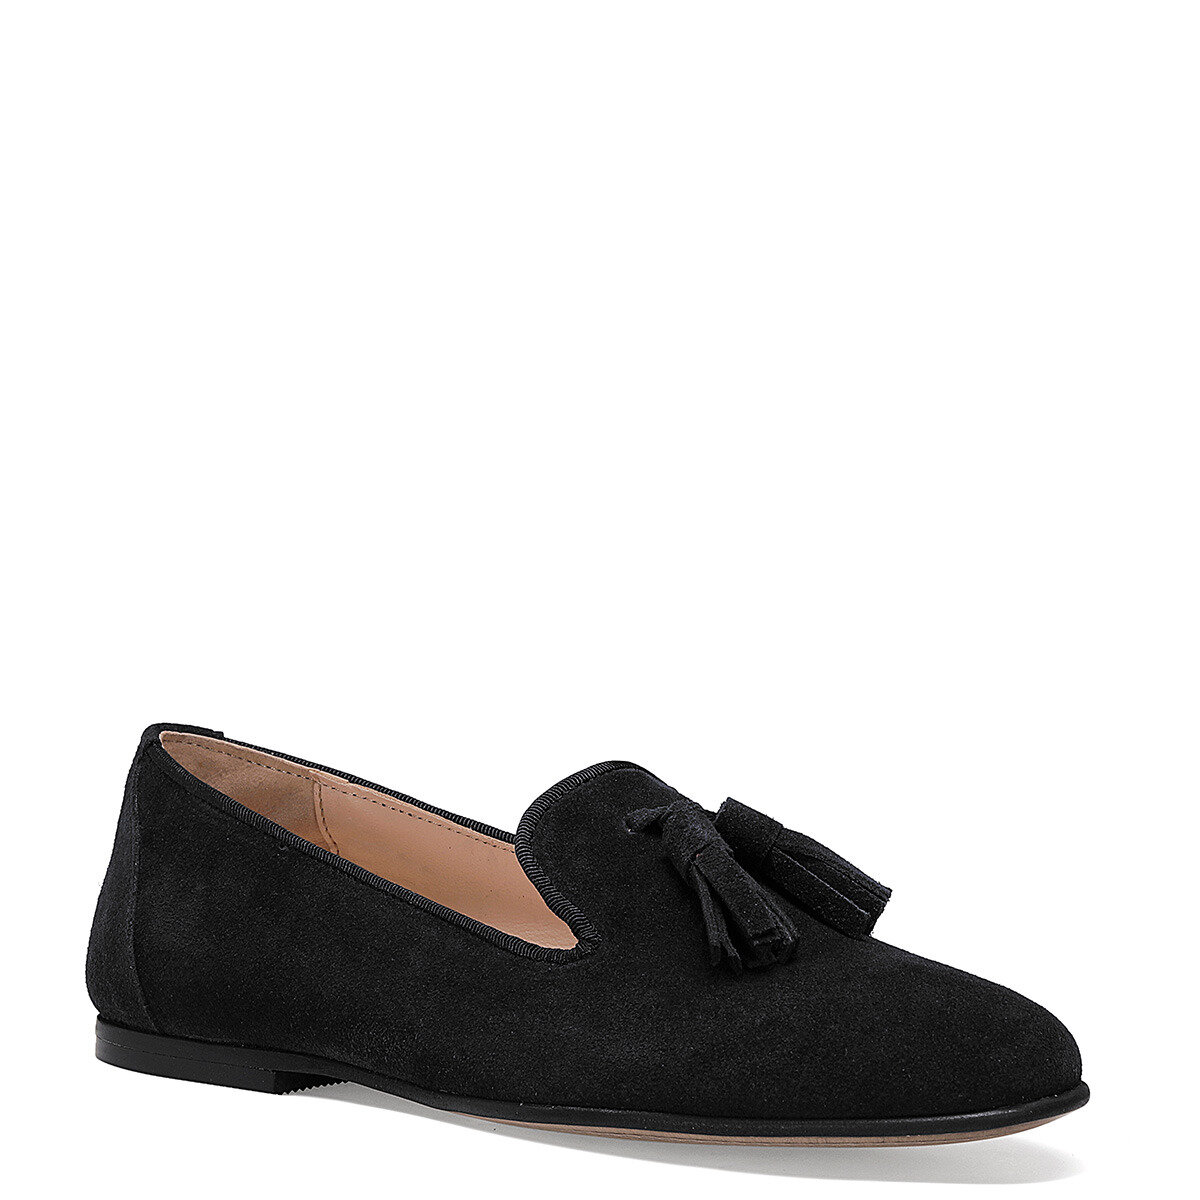 PANTO Siyah Kadın Loafer Ayakkabı